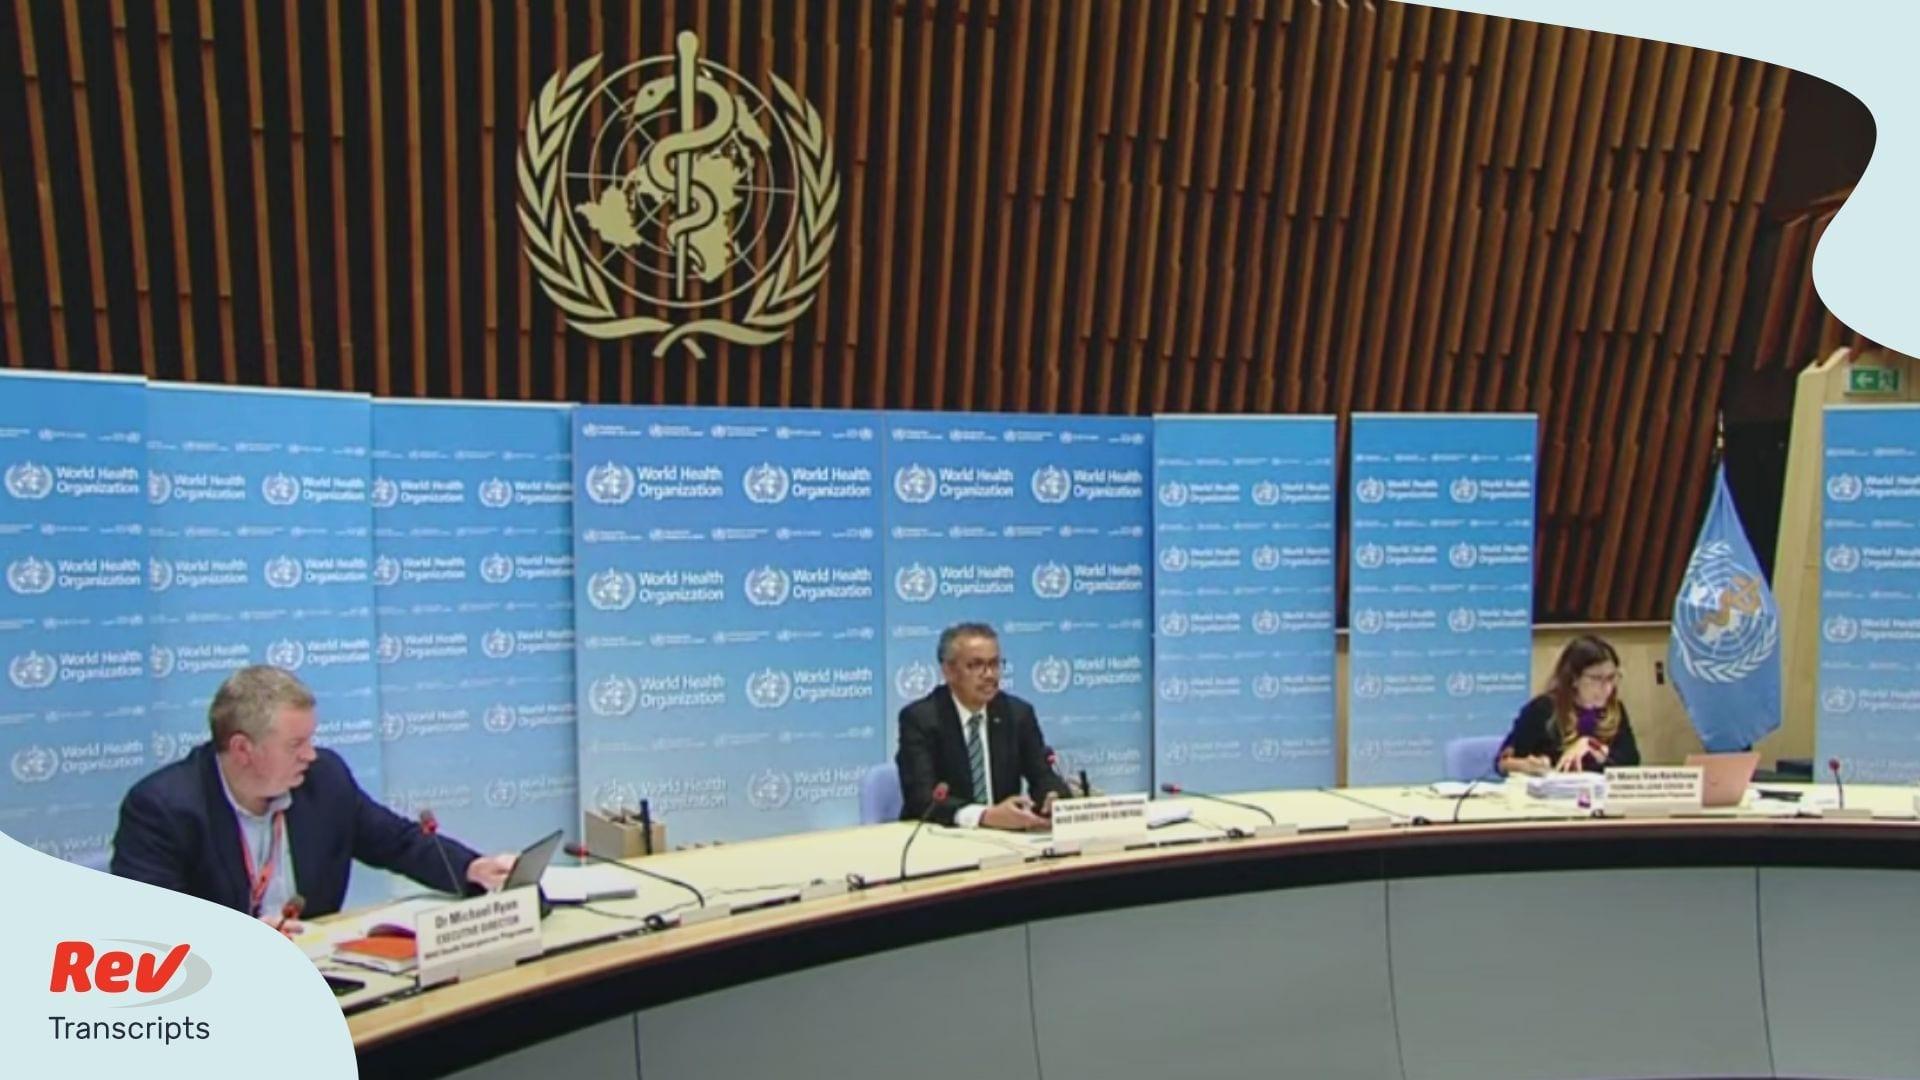 World Health Organization June 8 Press Conference